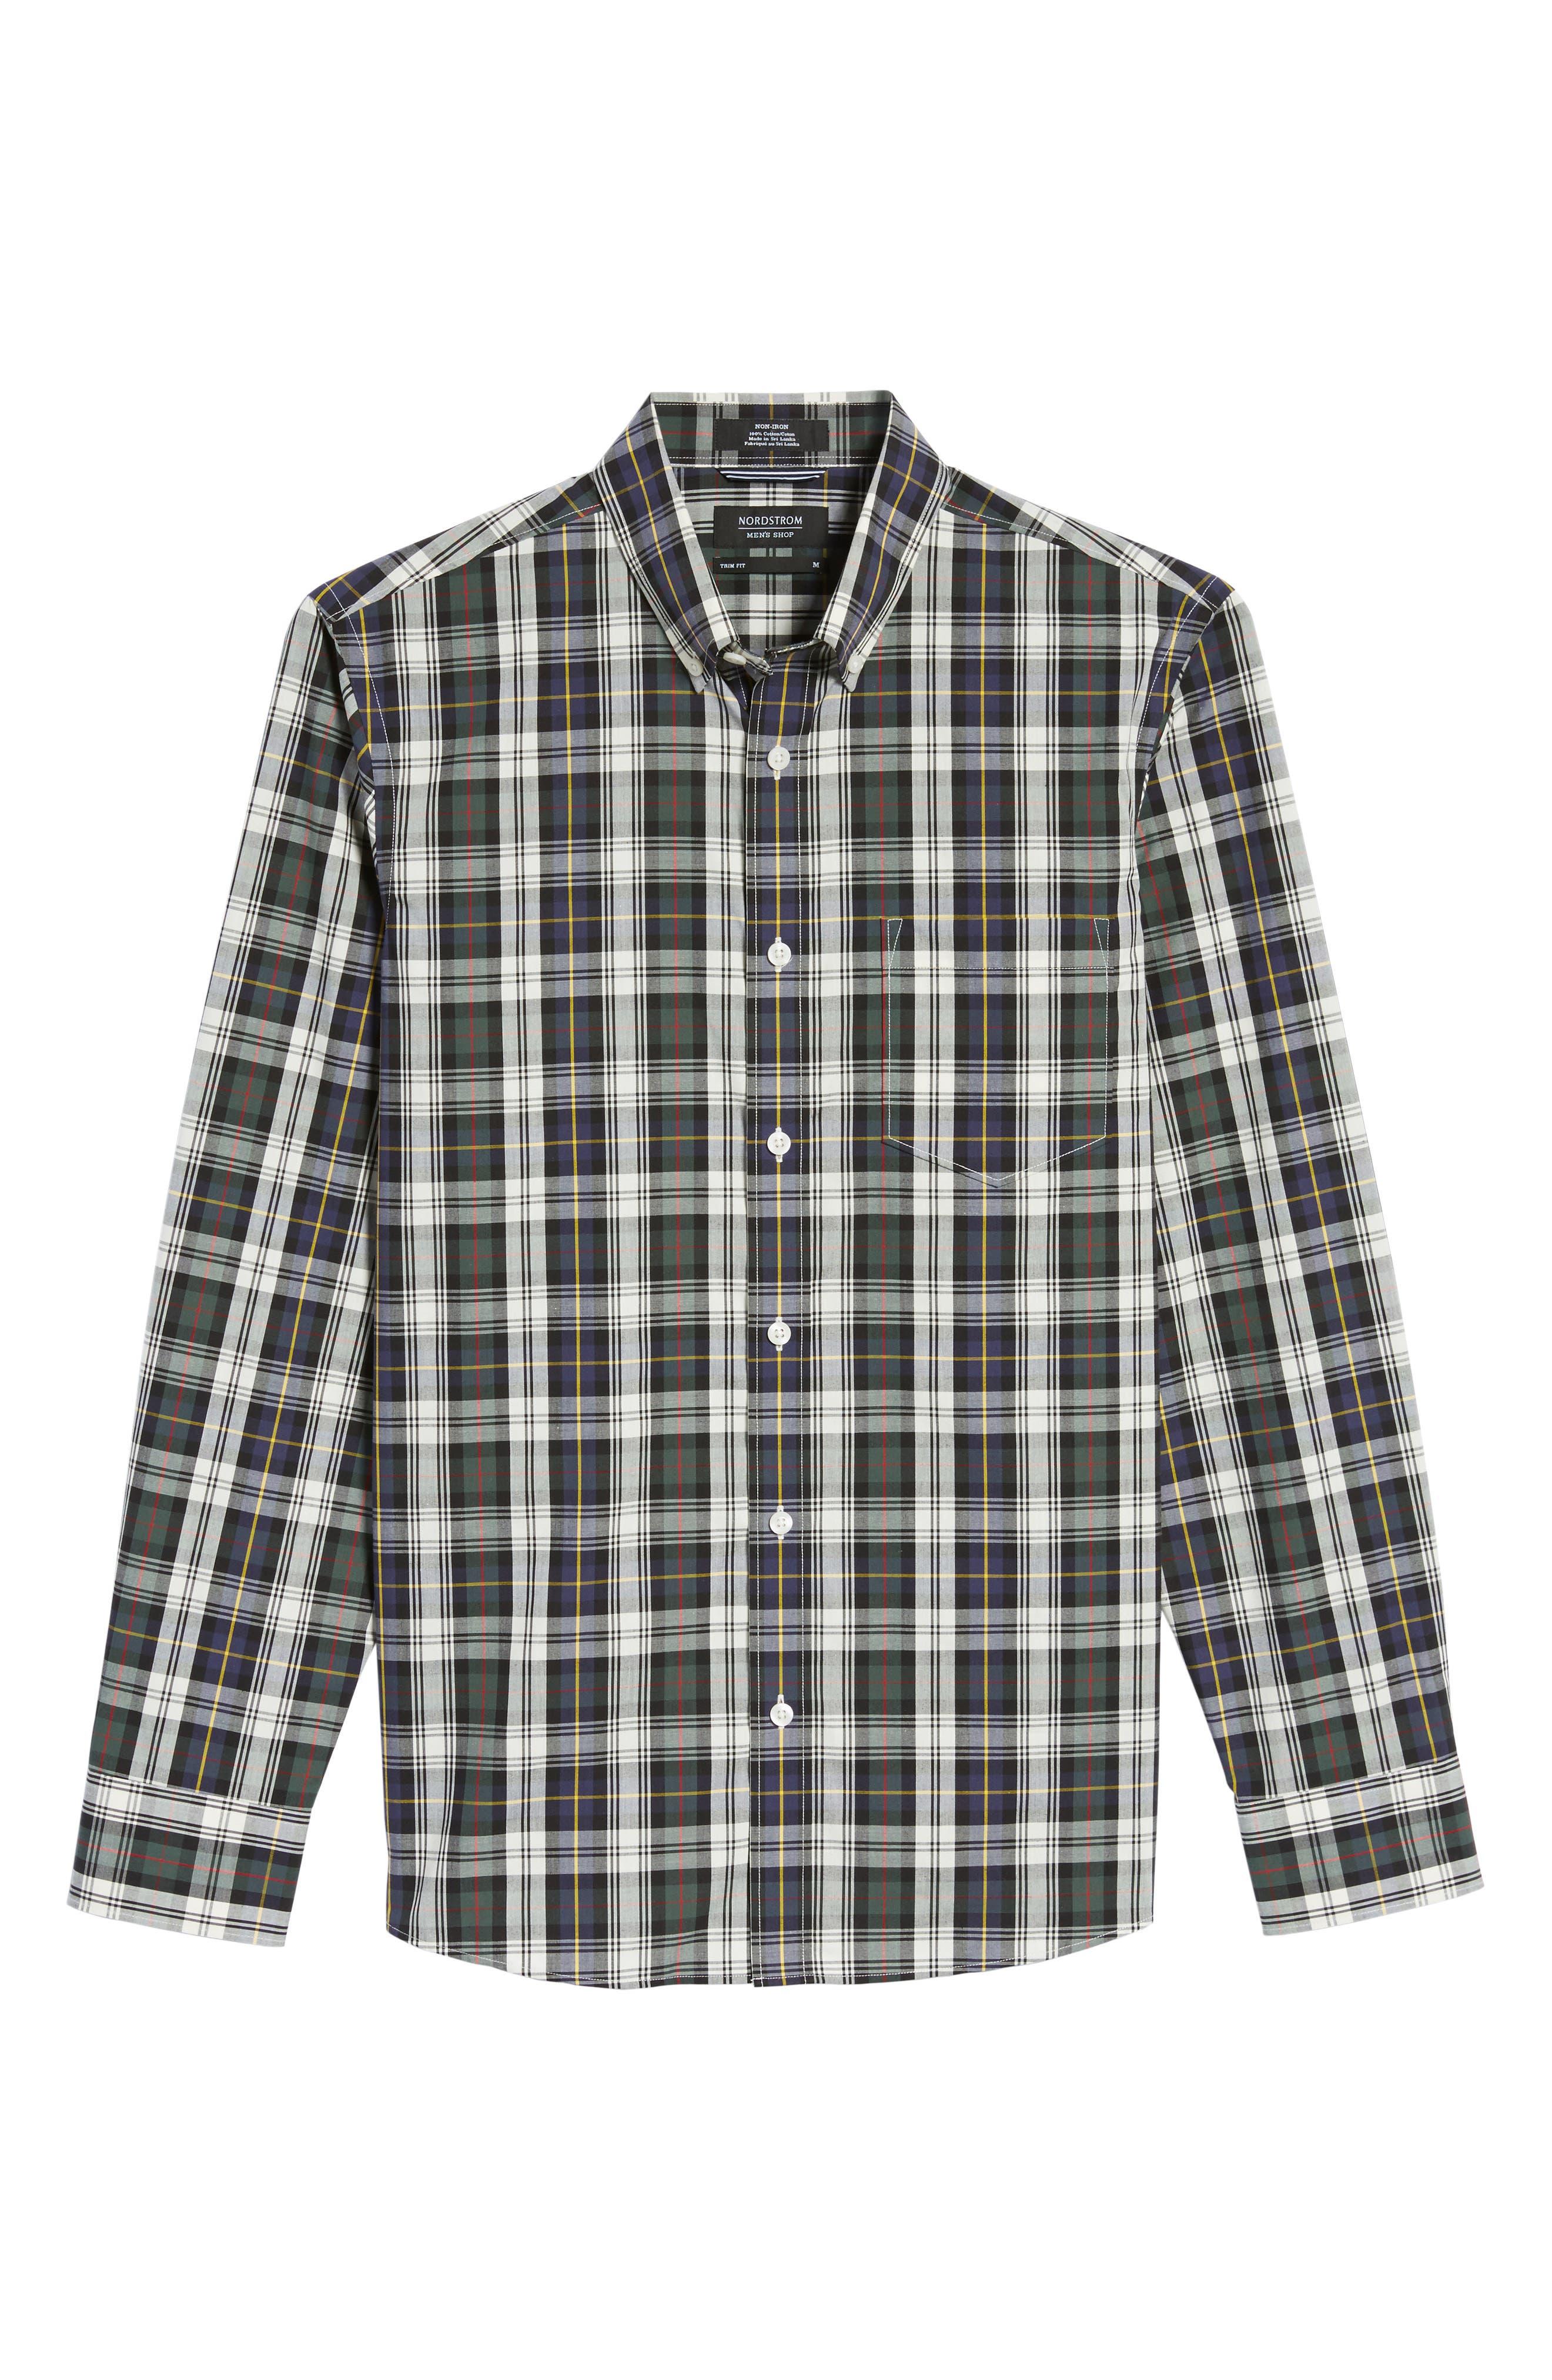 Trim Fit Non-Iron Plaid Sport Shirt,                             Alternate thumbnail 6, color,                             Ivory Egret Green Tartan